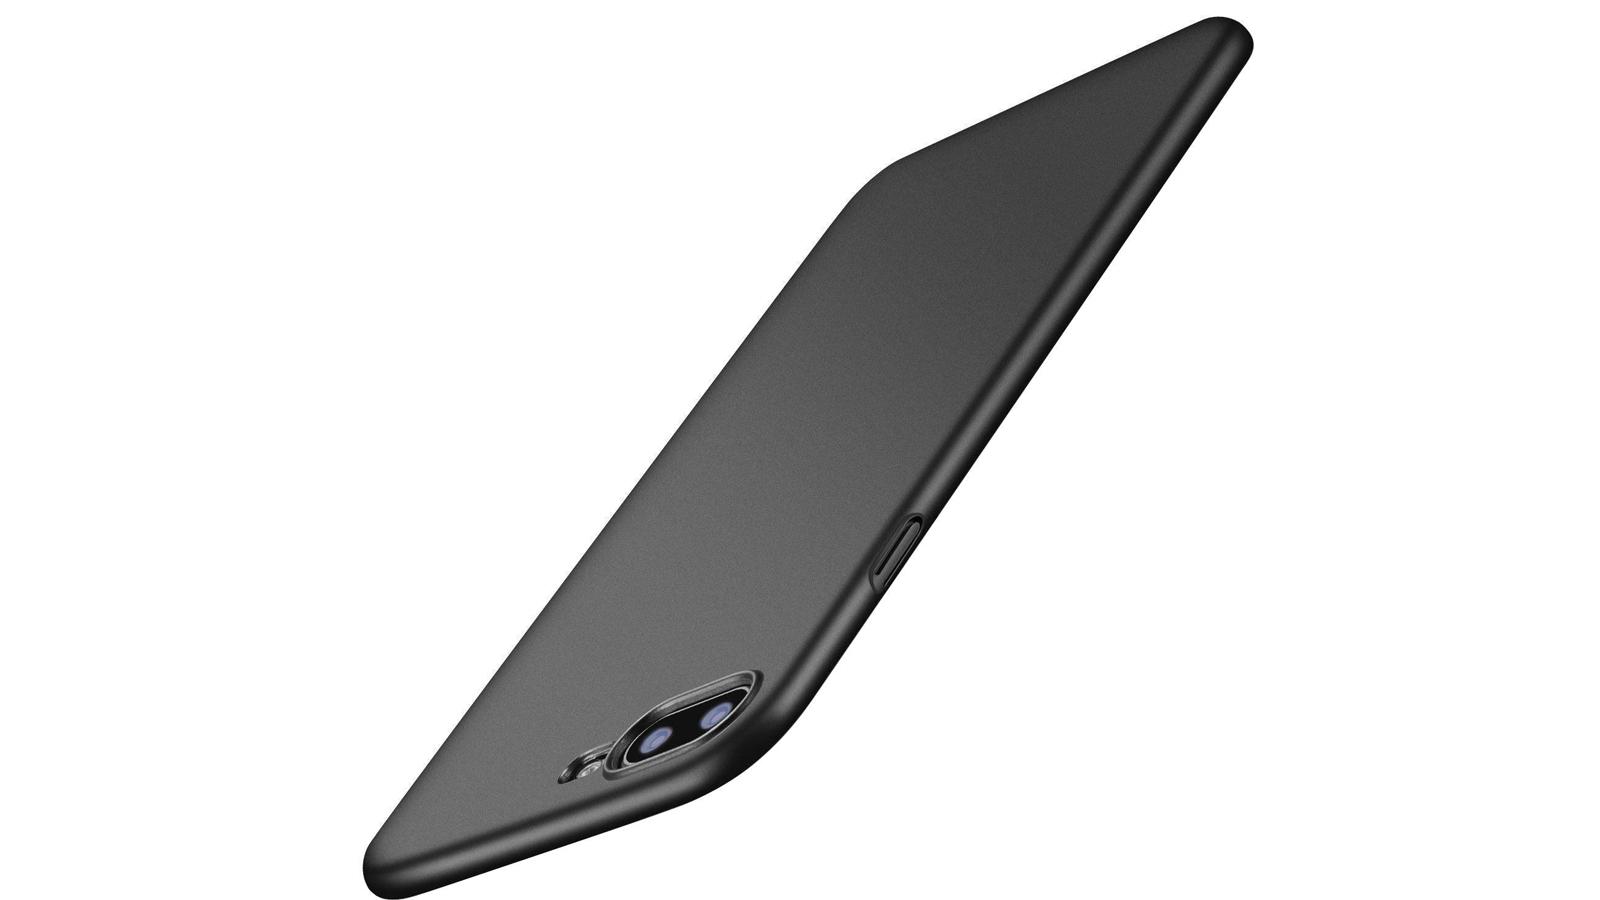 3iGdADo2uj7nHqhiKDpx2o - The best iPhone 7 Plus cases